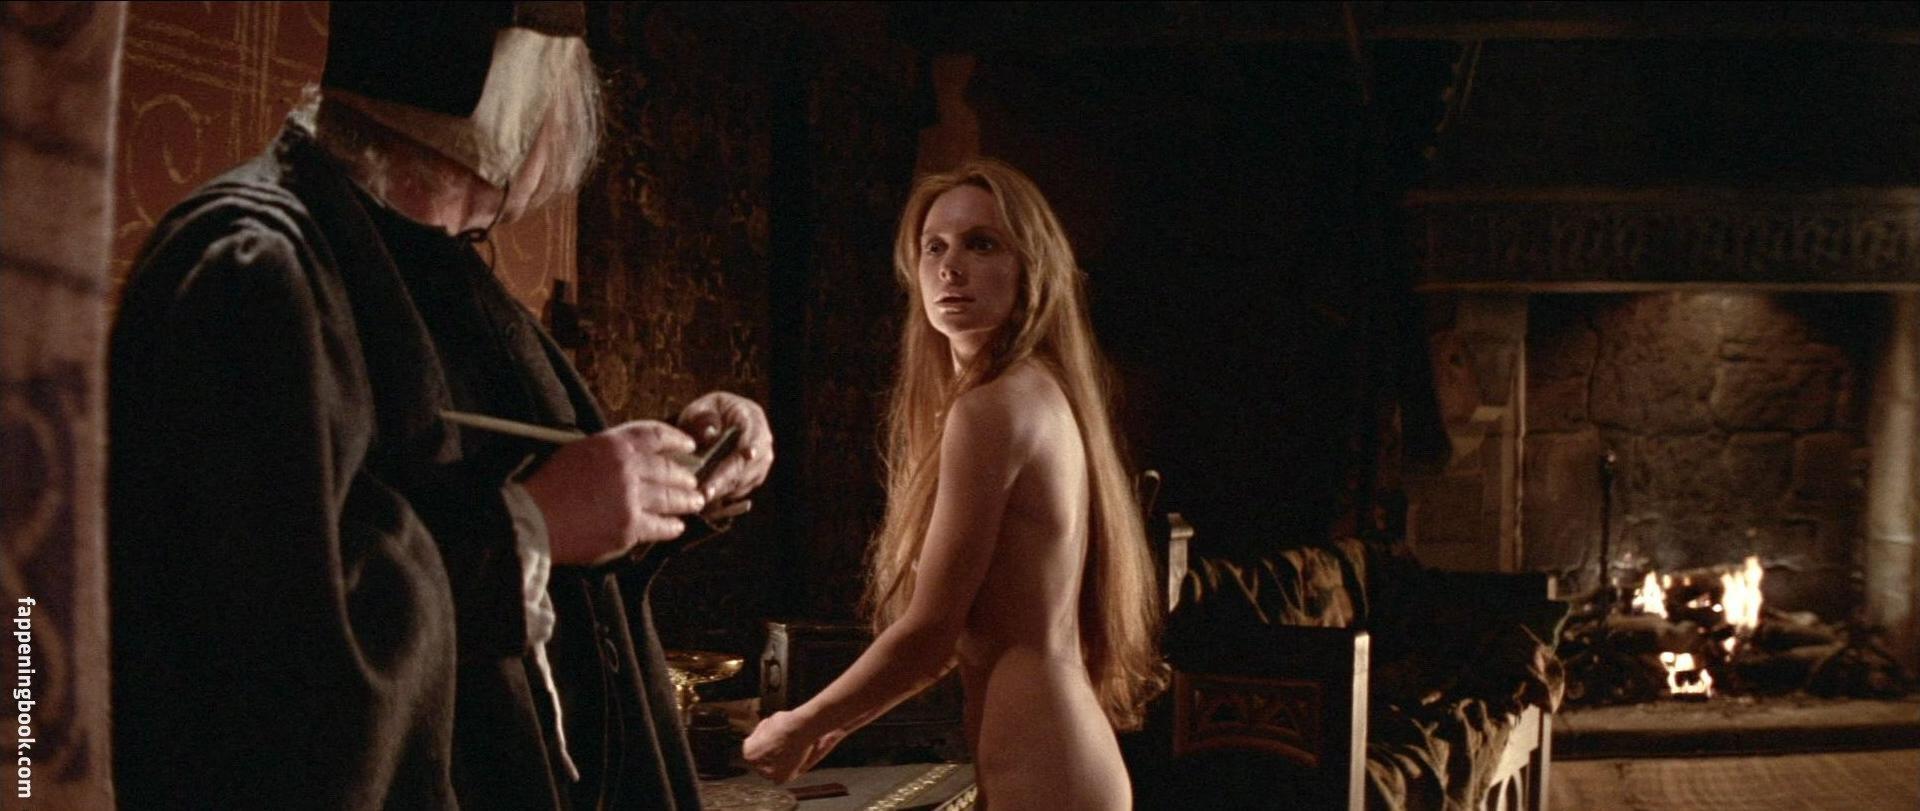 Sexy video khullam khulla open